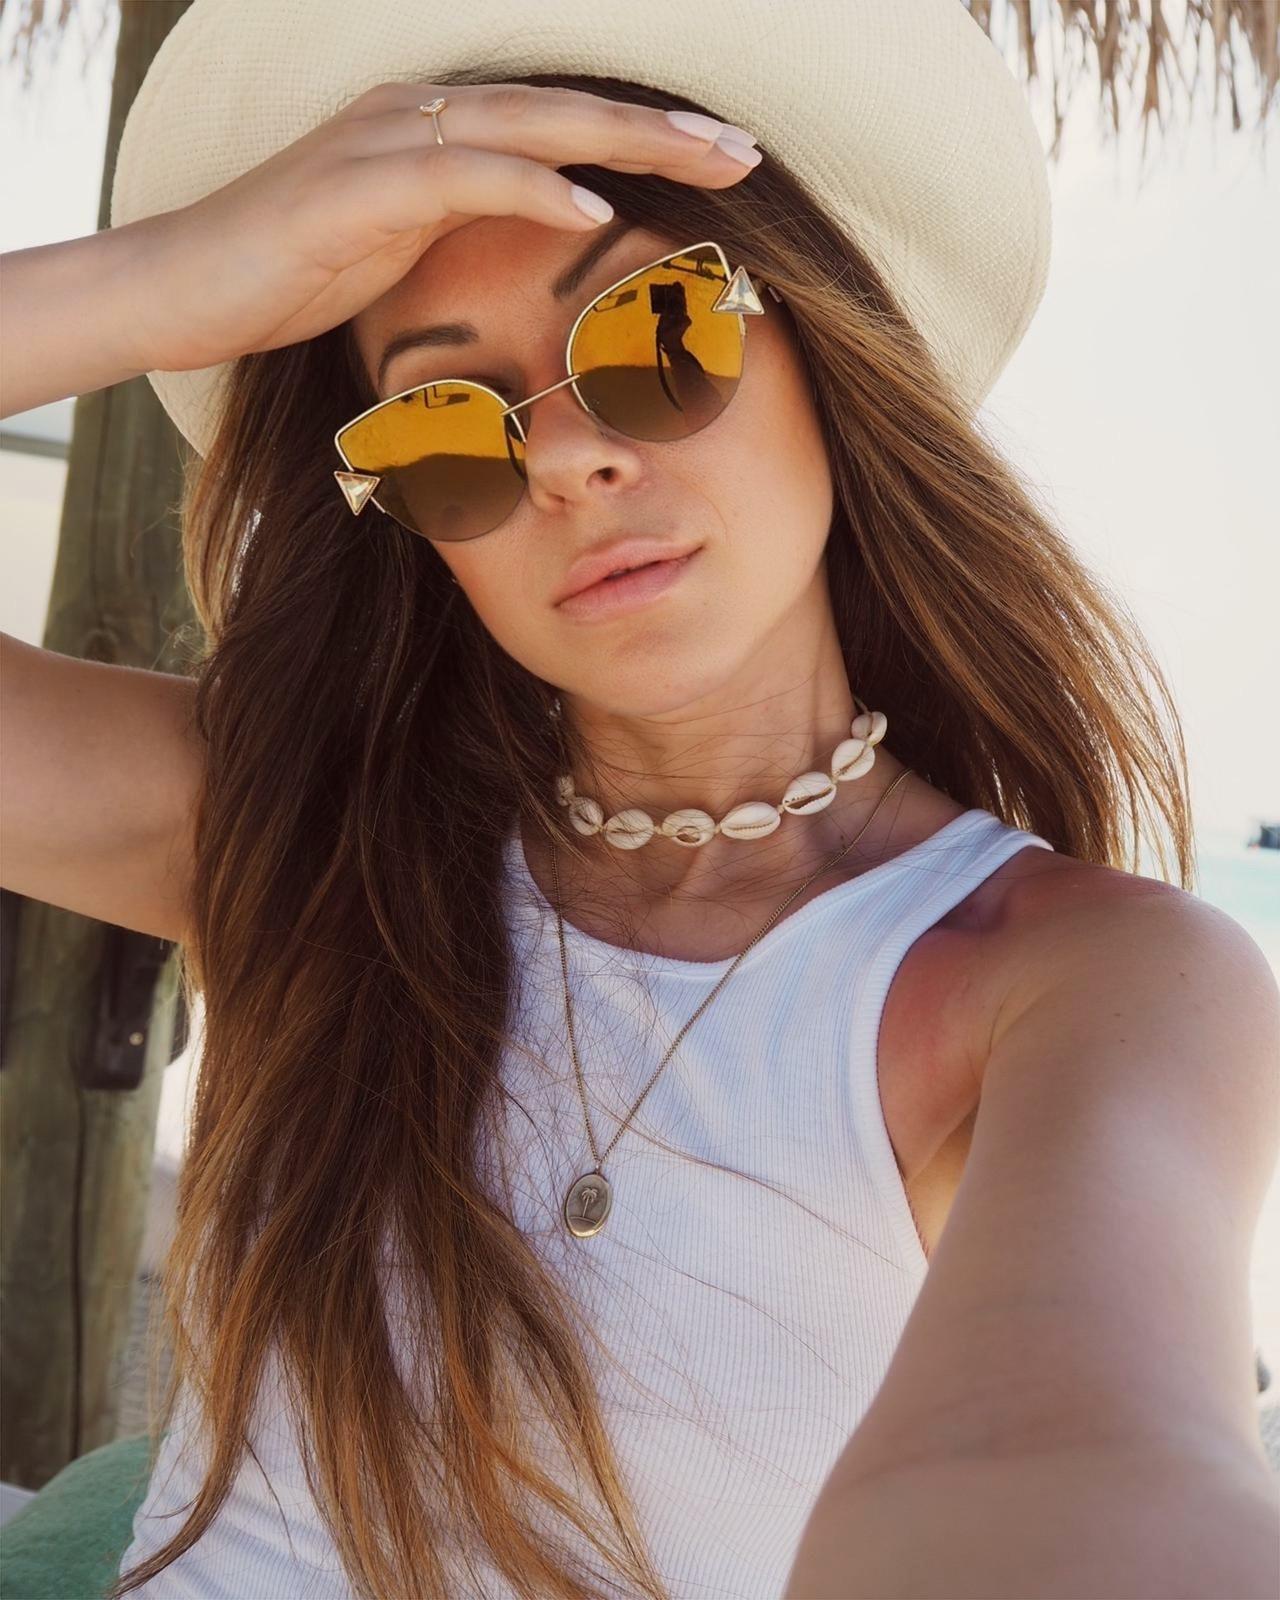 white tank top outfit | Julia Lundin